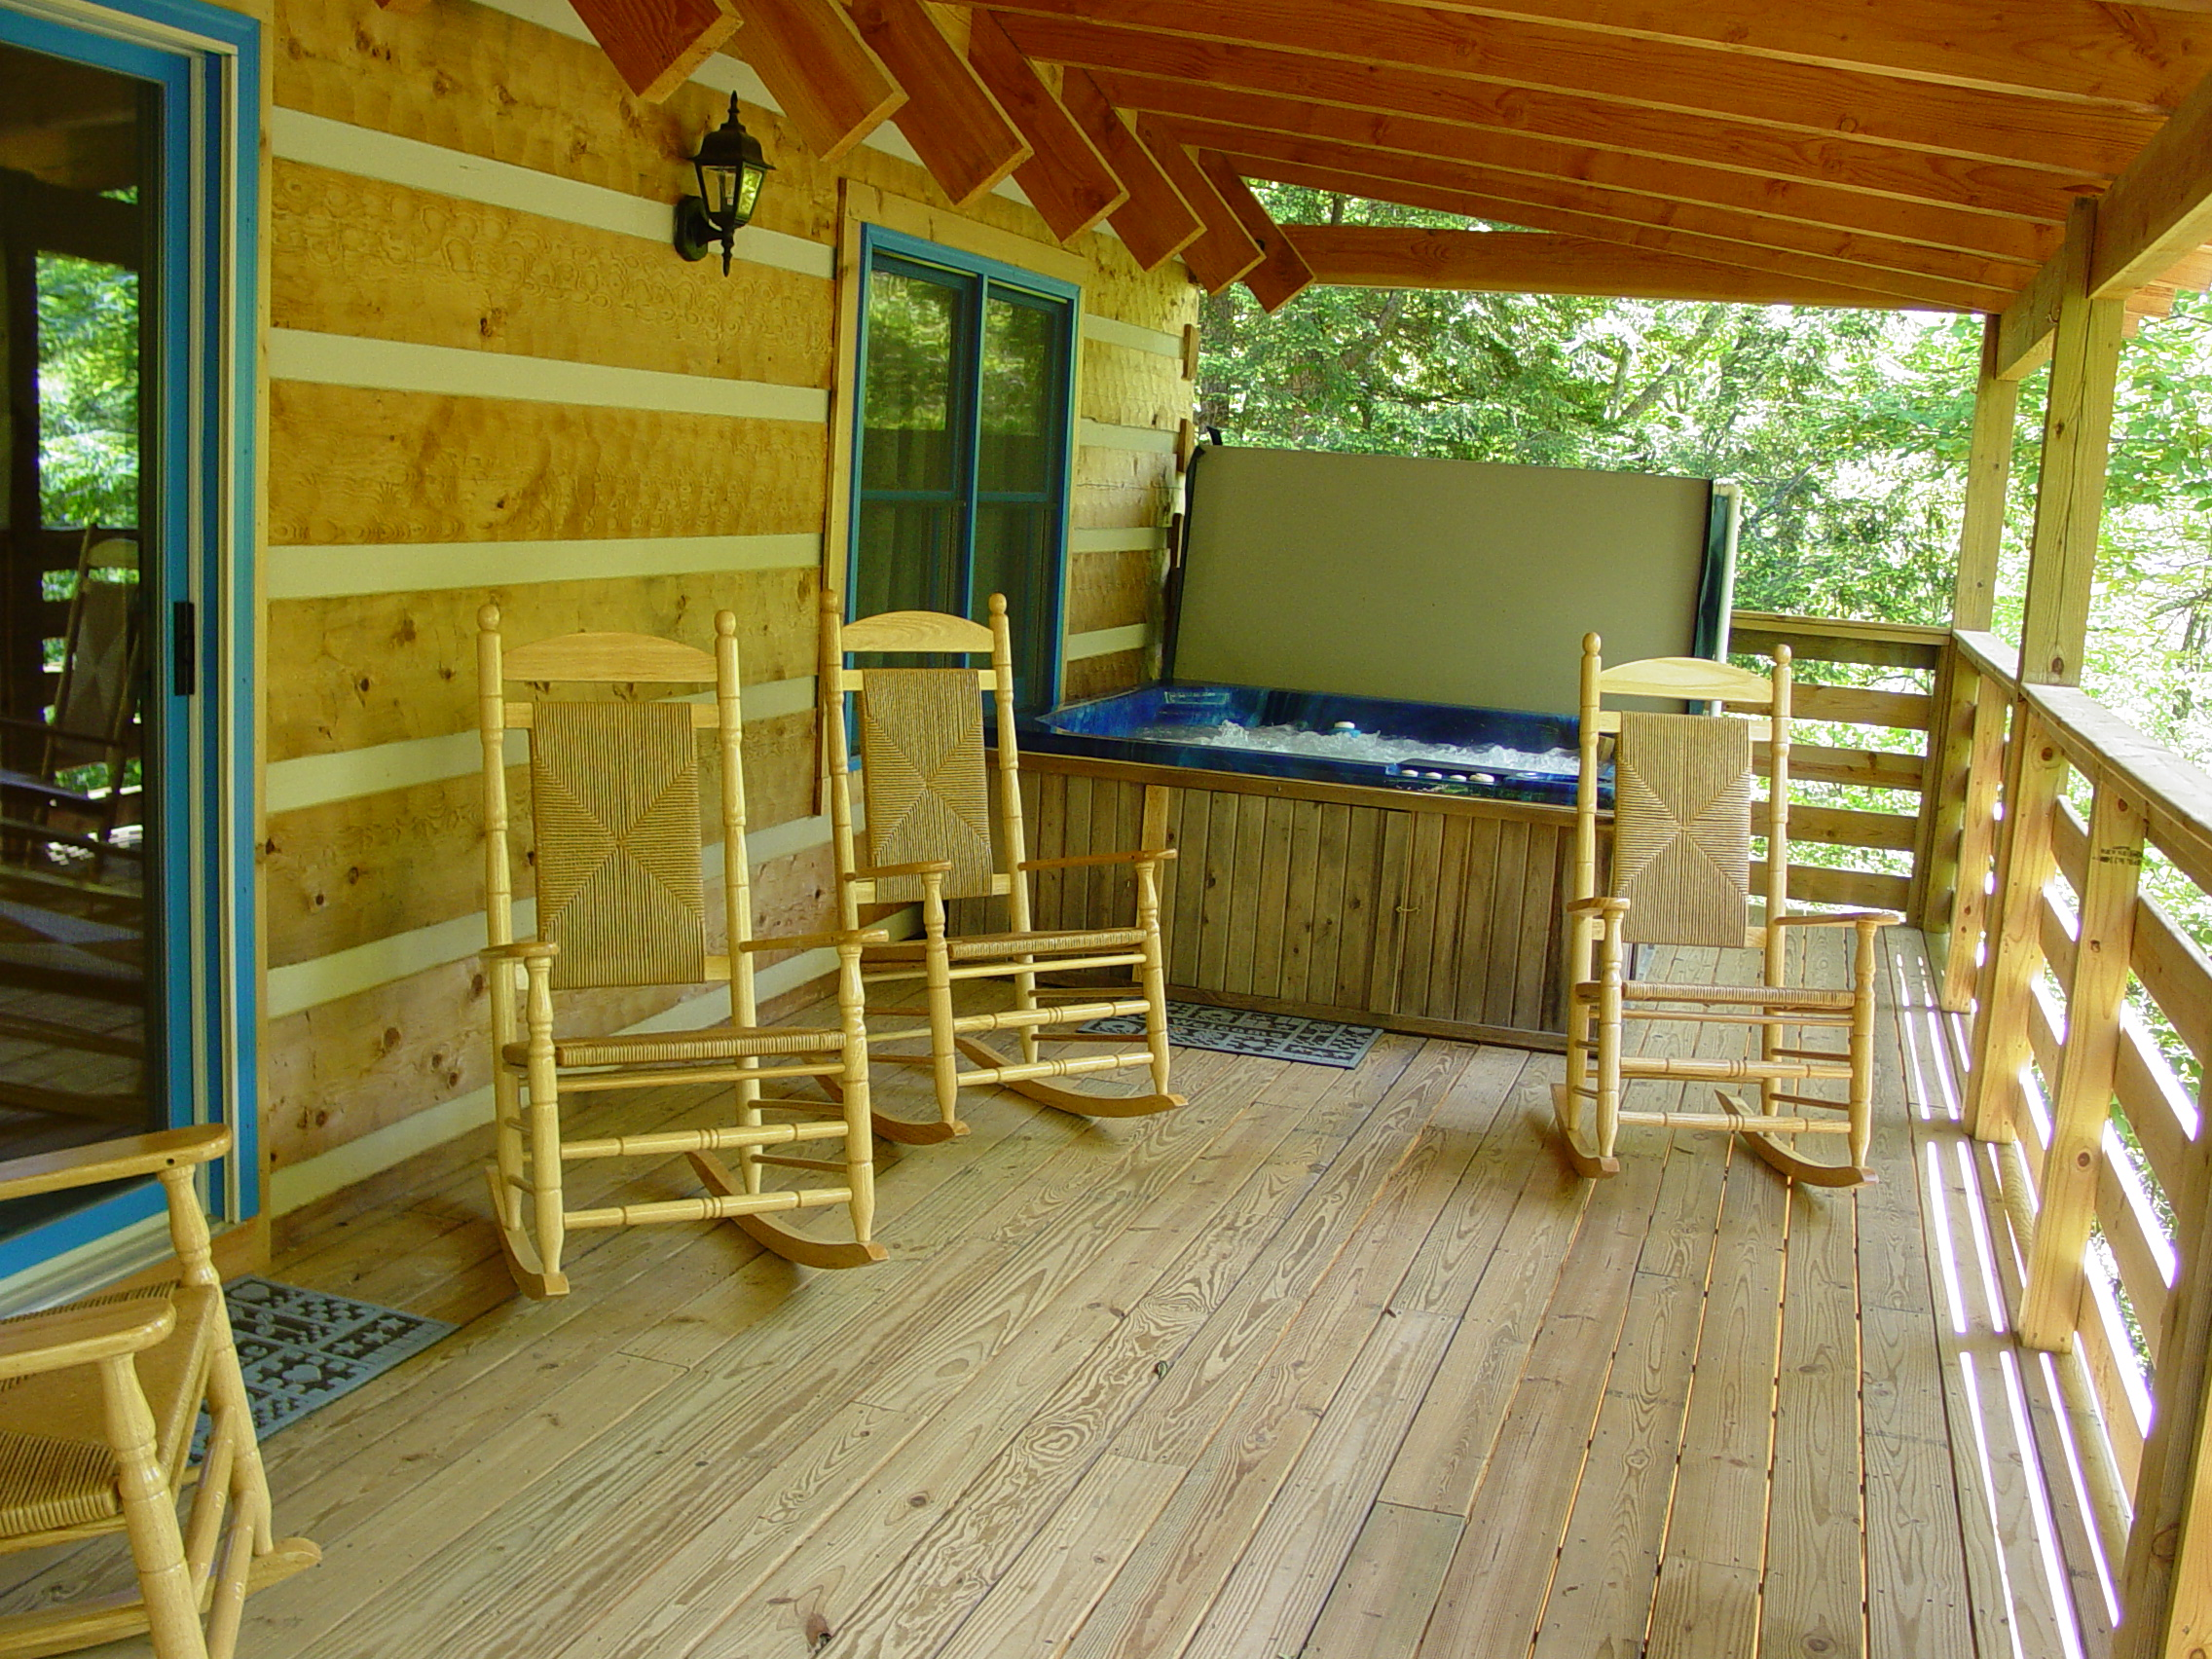 WC - Porch Rocking Chairs Hot Tub 4.jpg